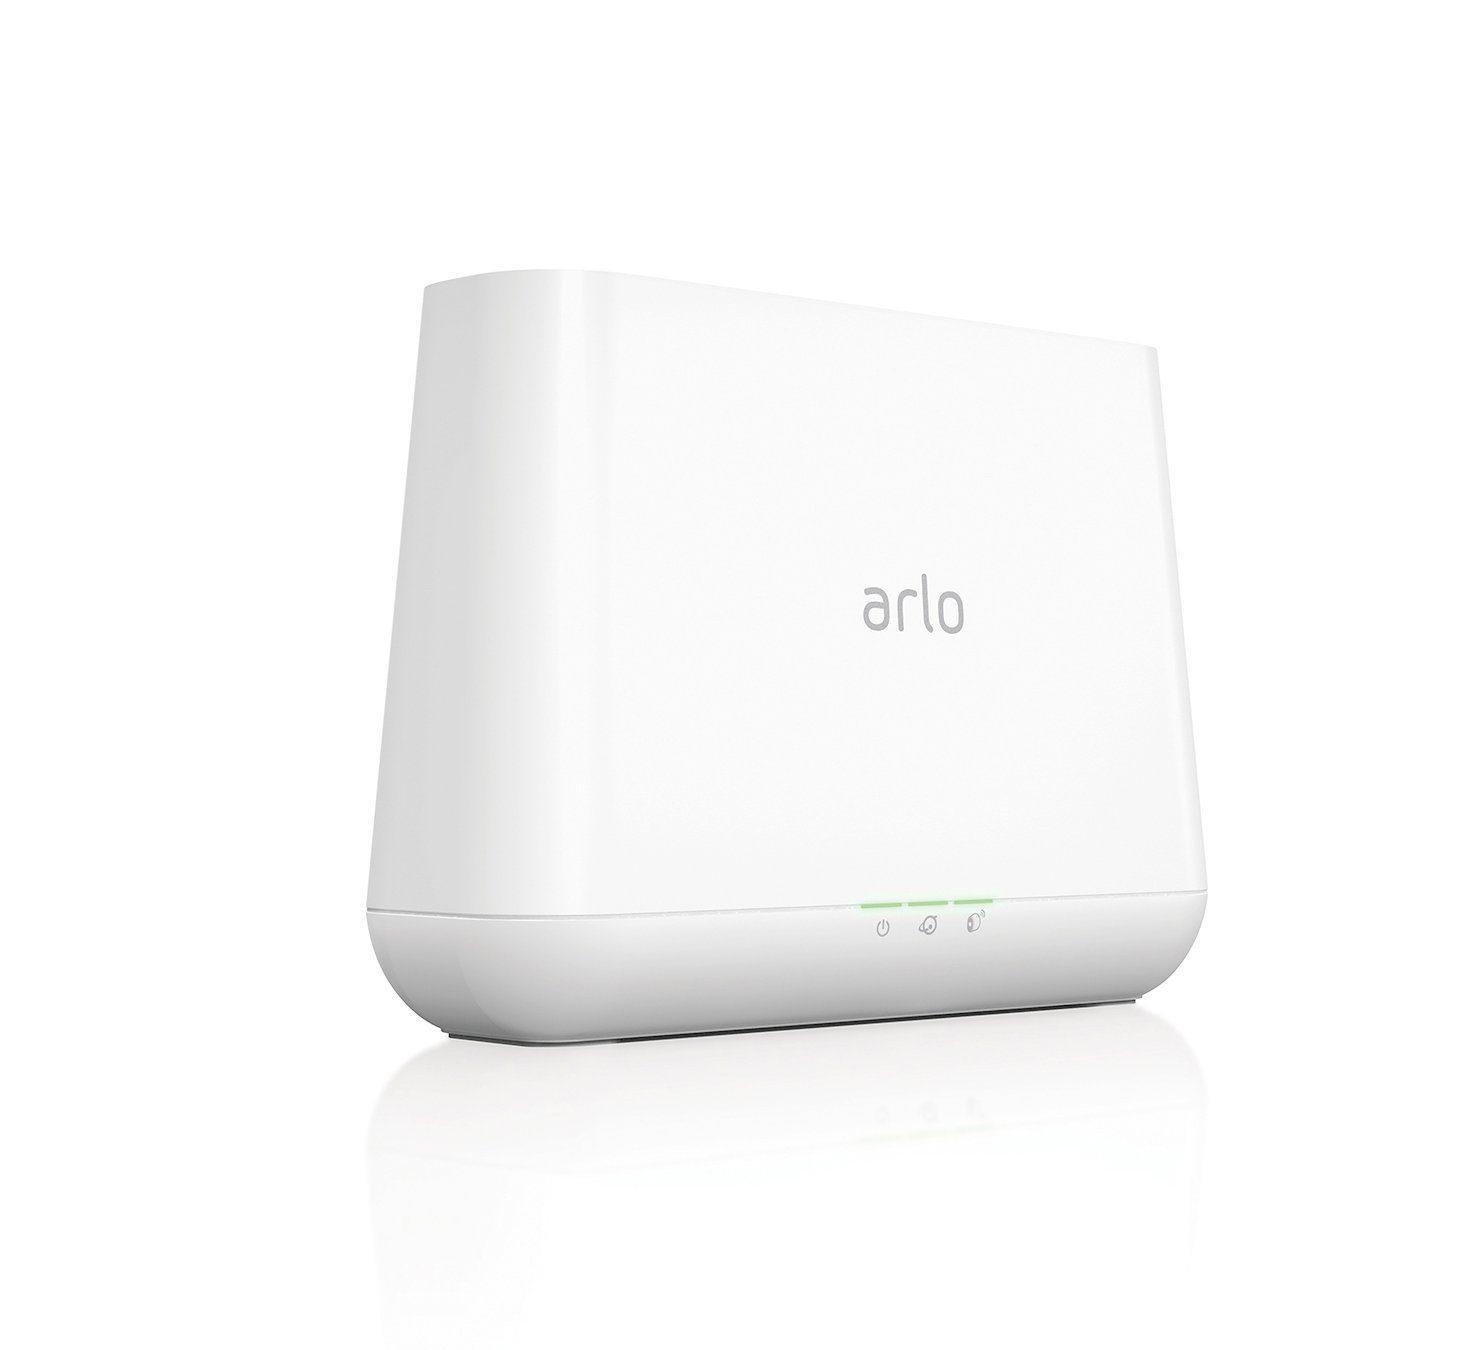 Arlo Netzwerkkamera Zubehör »Arlo Pro Basisstation m.Sirene«